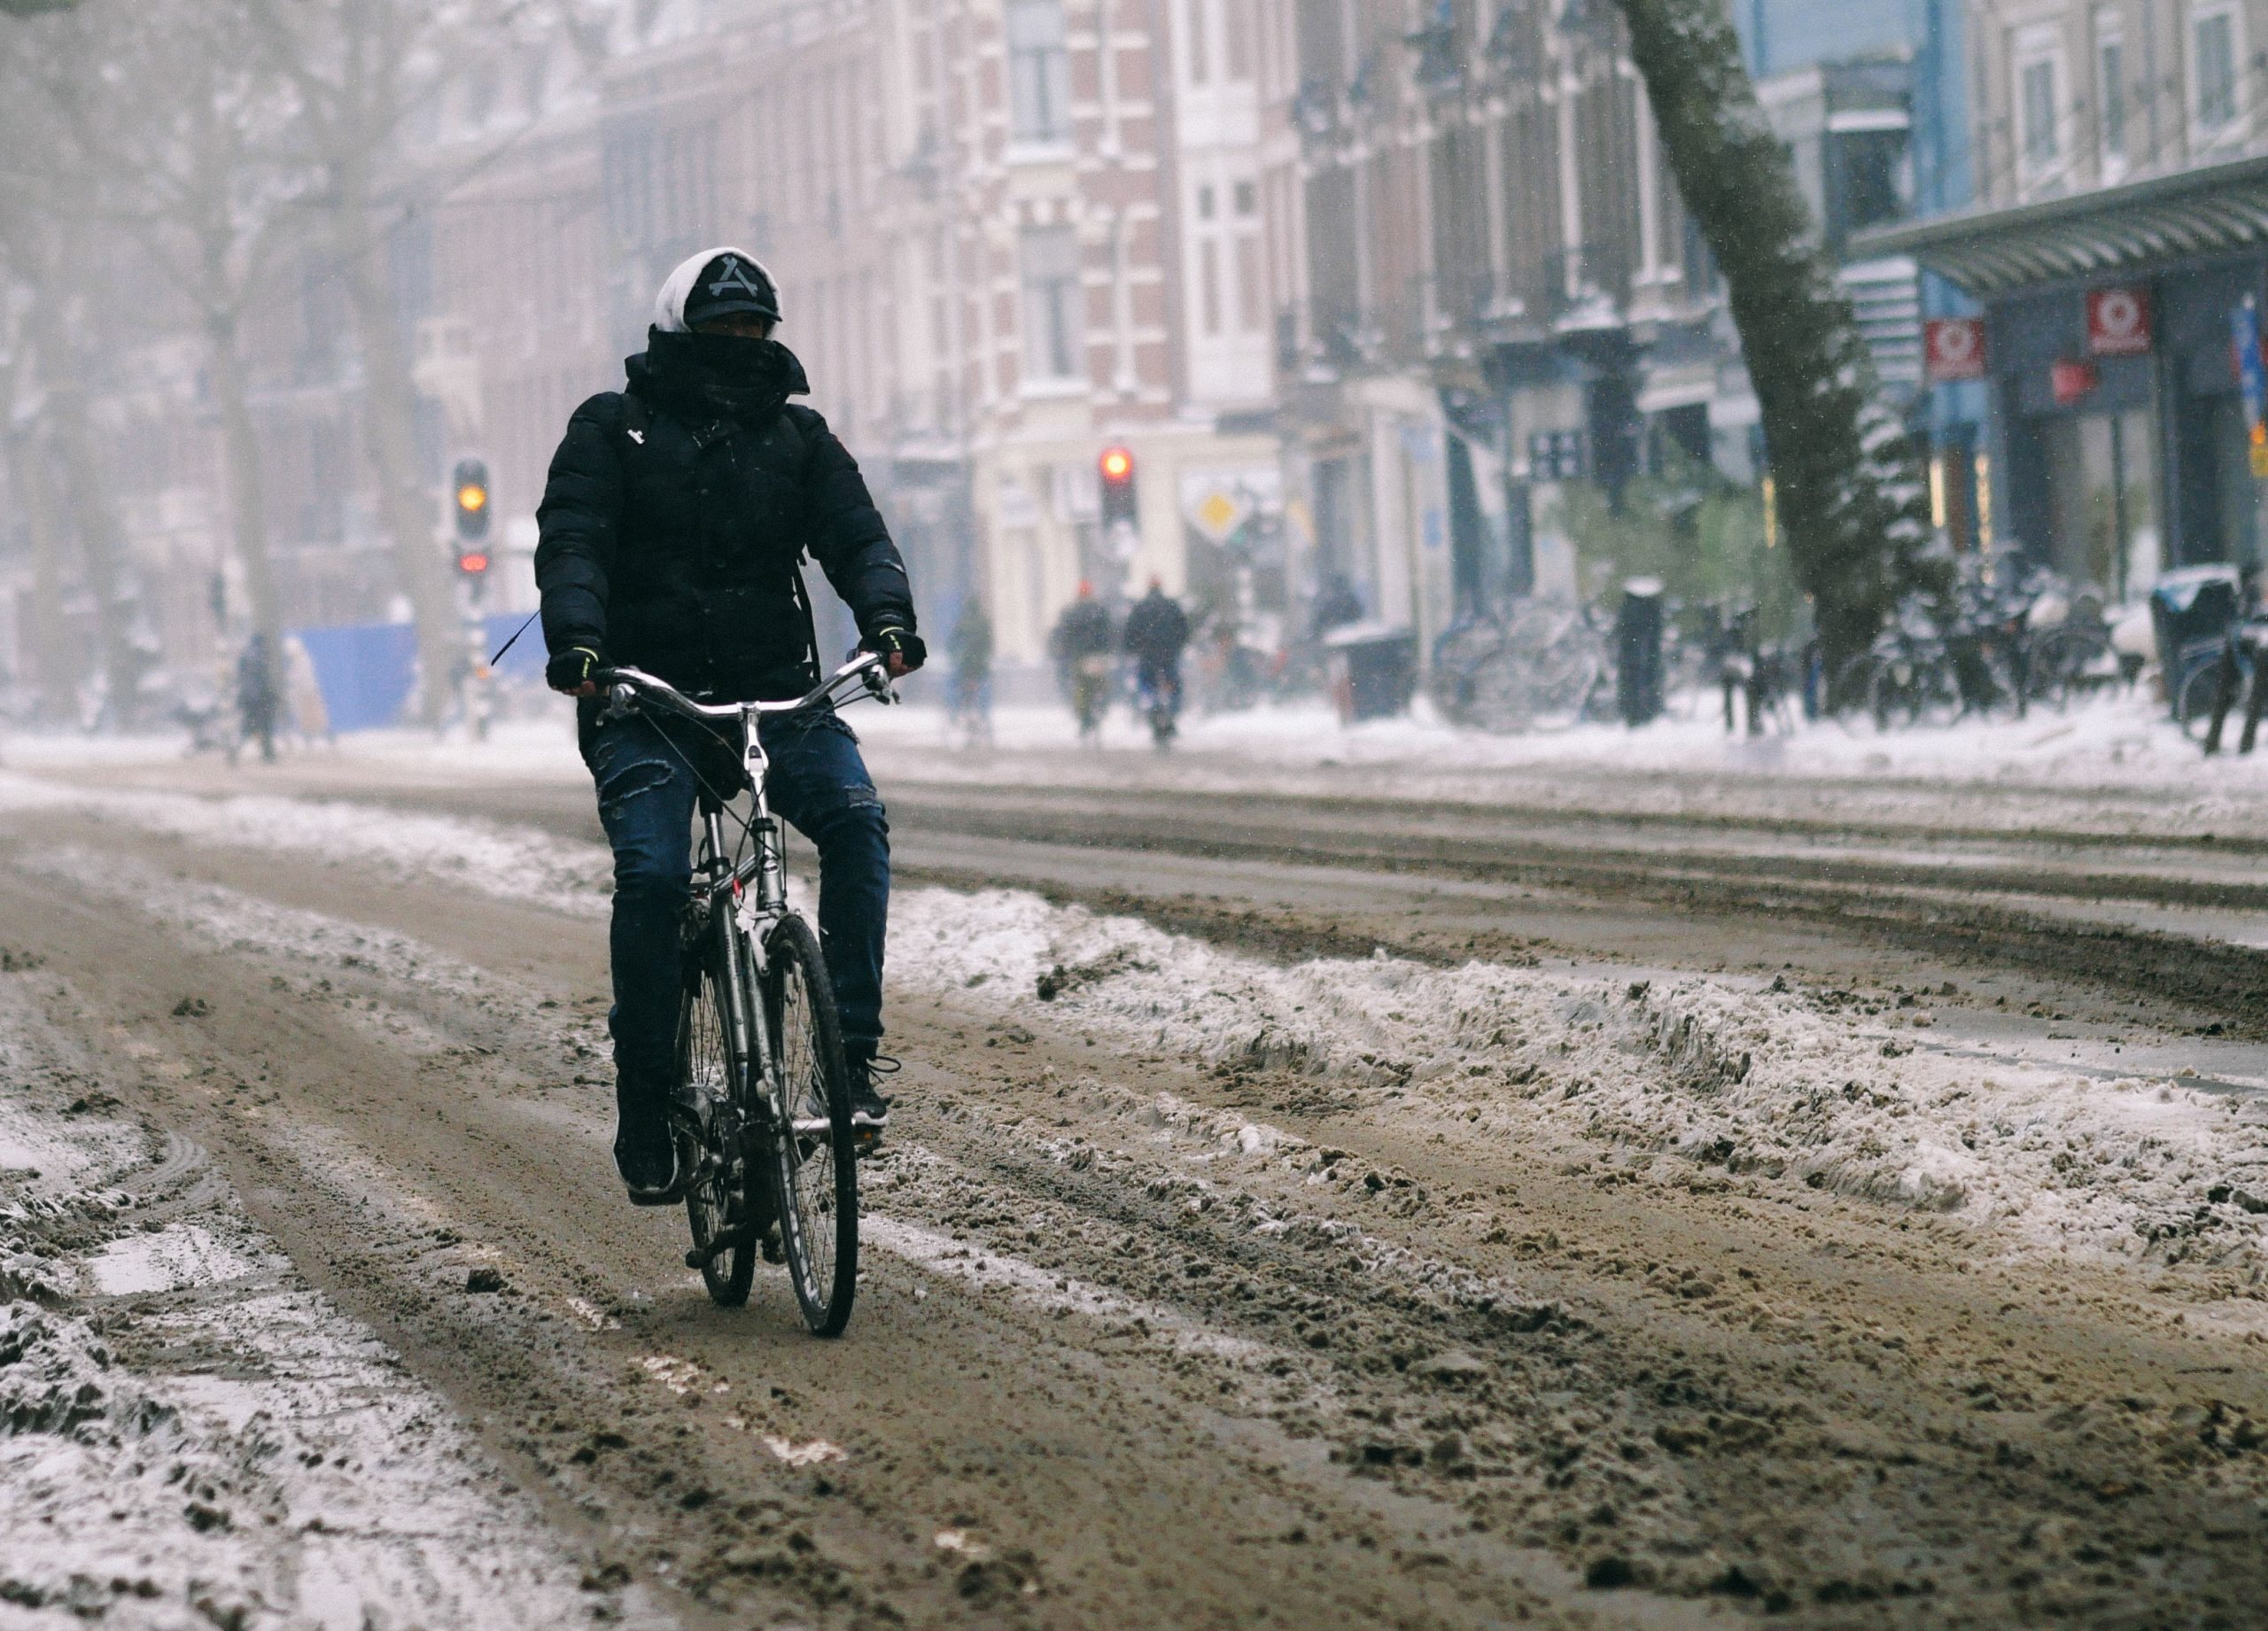 Snowstorm hits Amsterdam